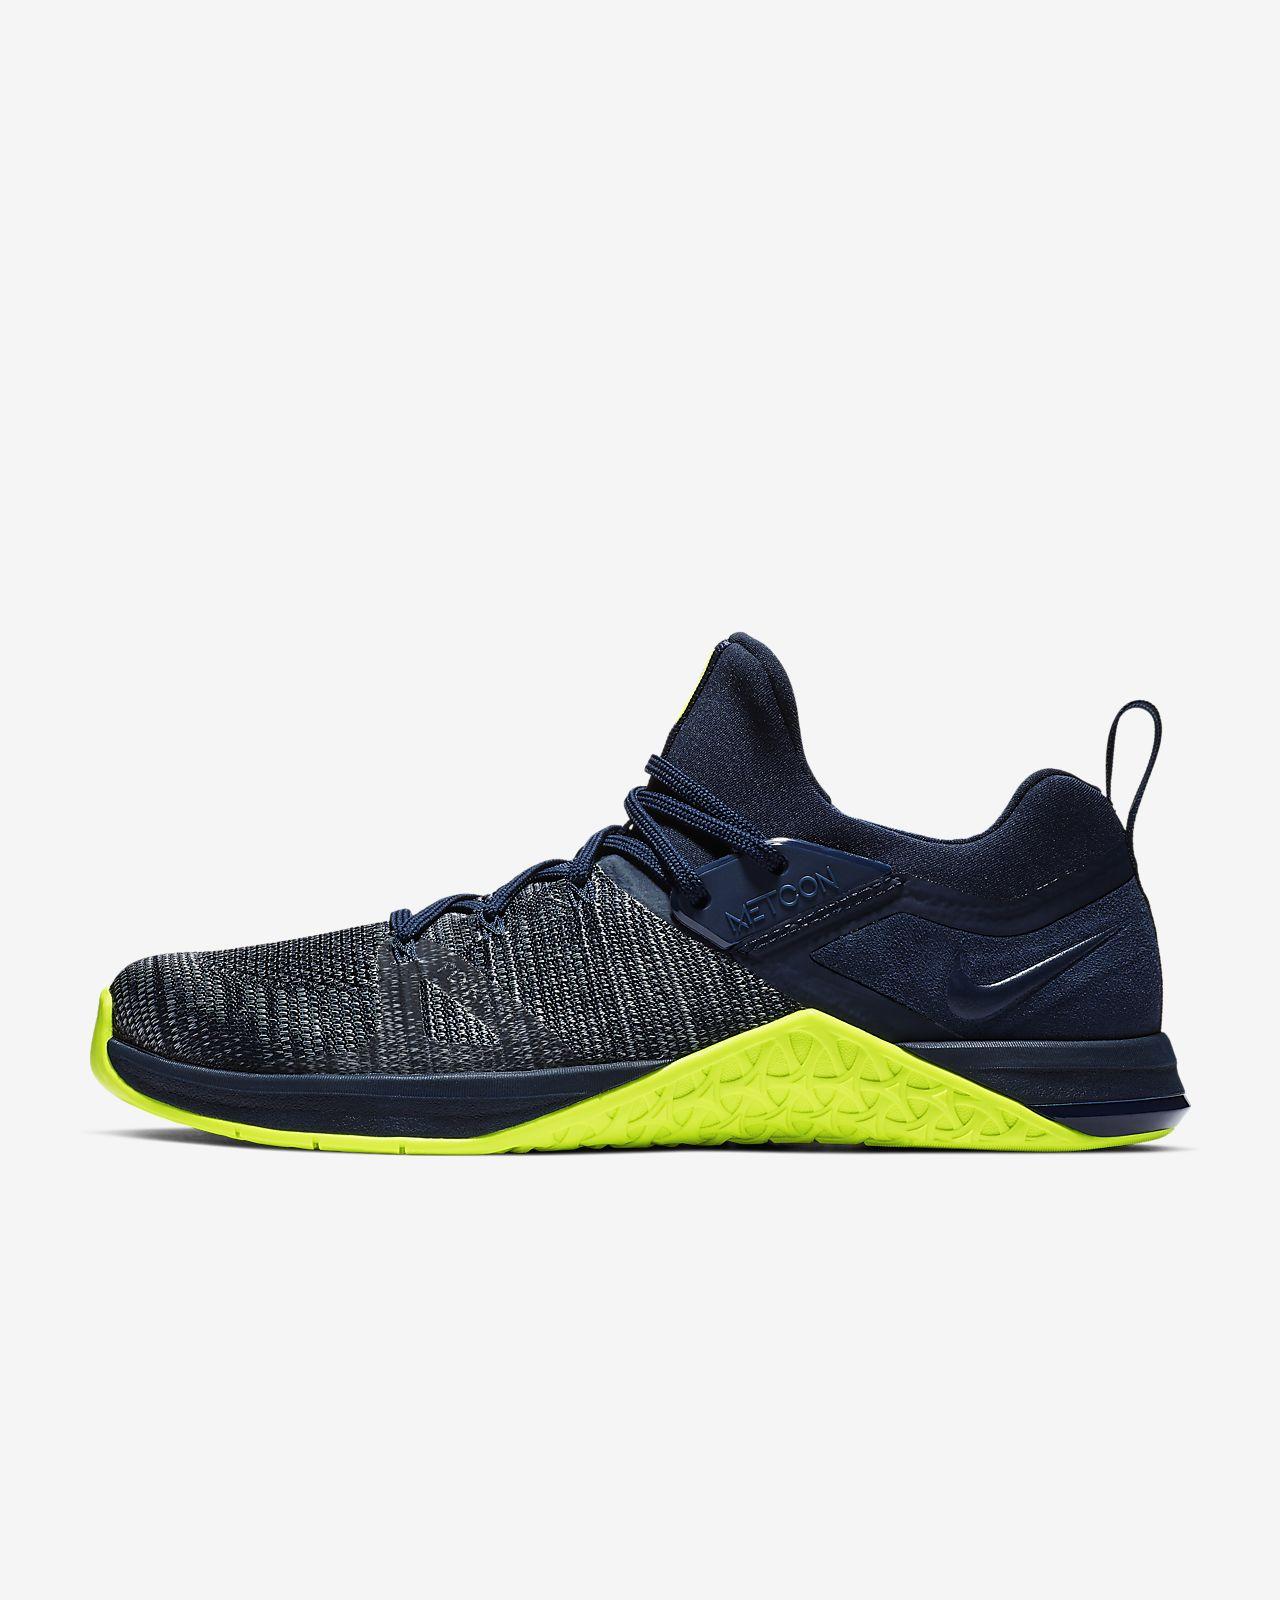 sale retailer d191f a63e9 ... gewichtheffen Nike Metcon Flyknit 3 Herenschoen voor crosstraining en  gewichtheffen